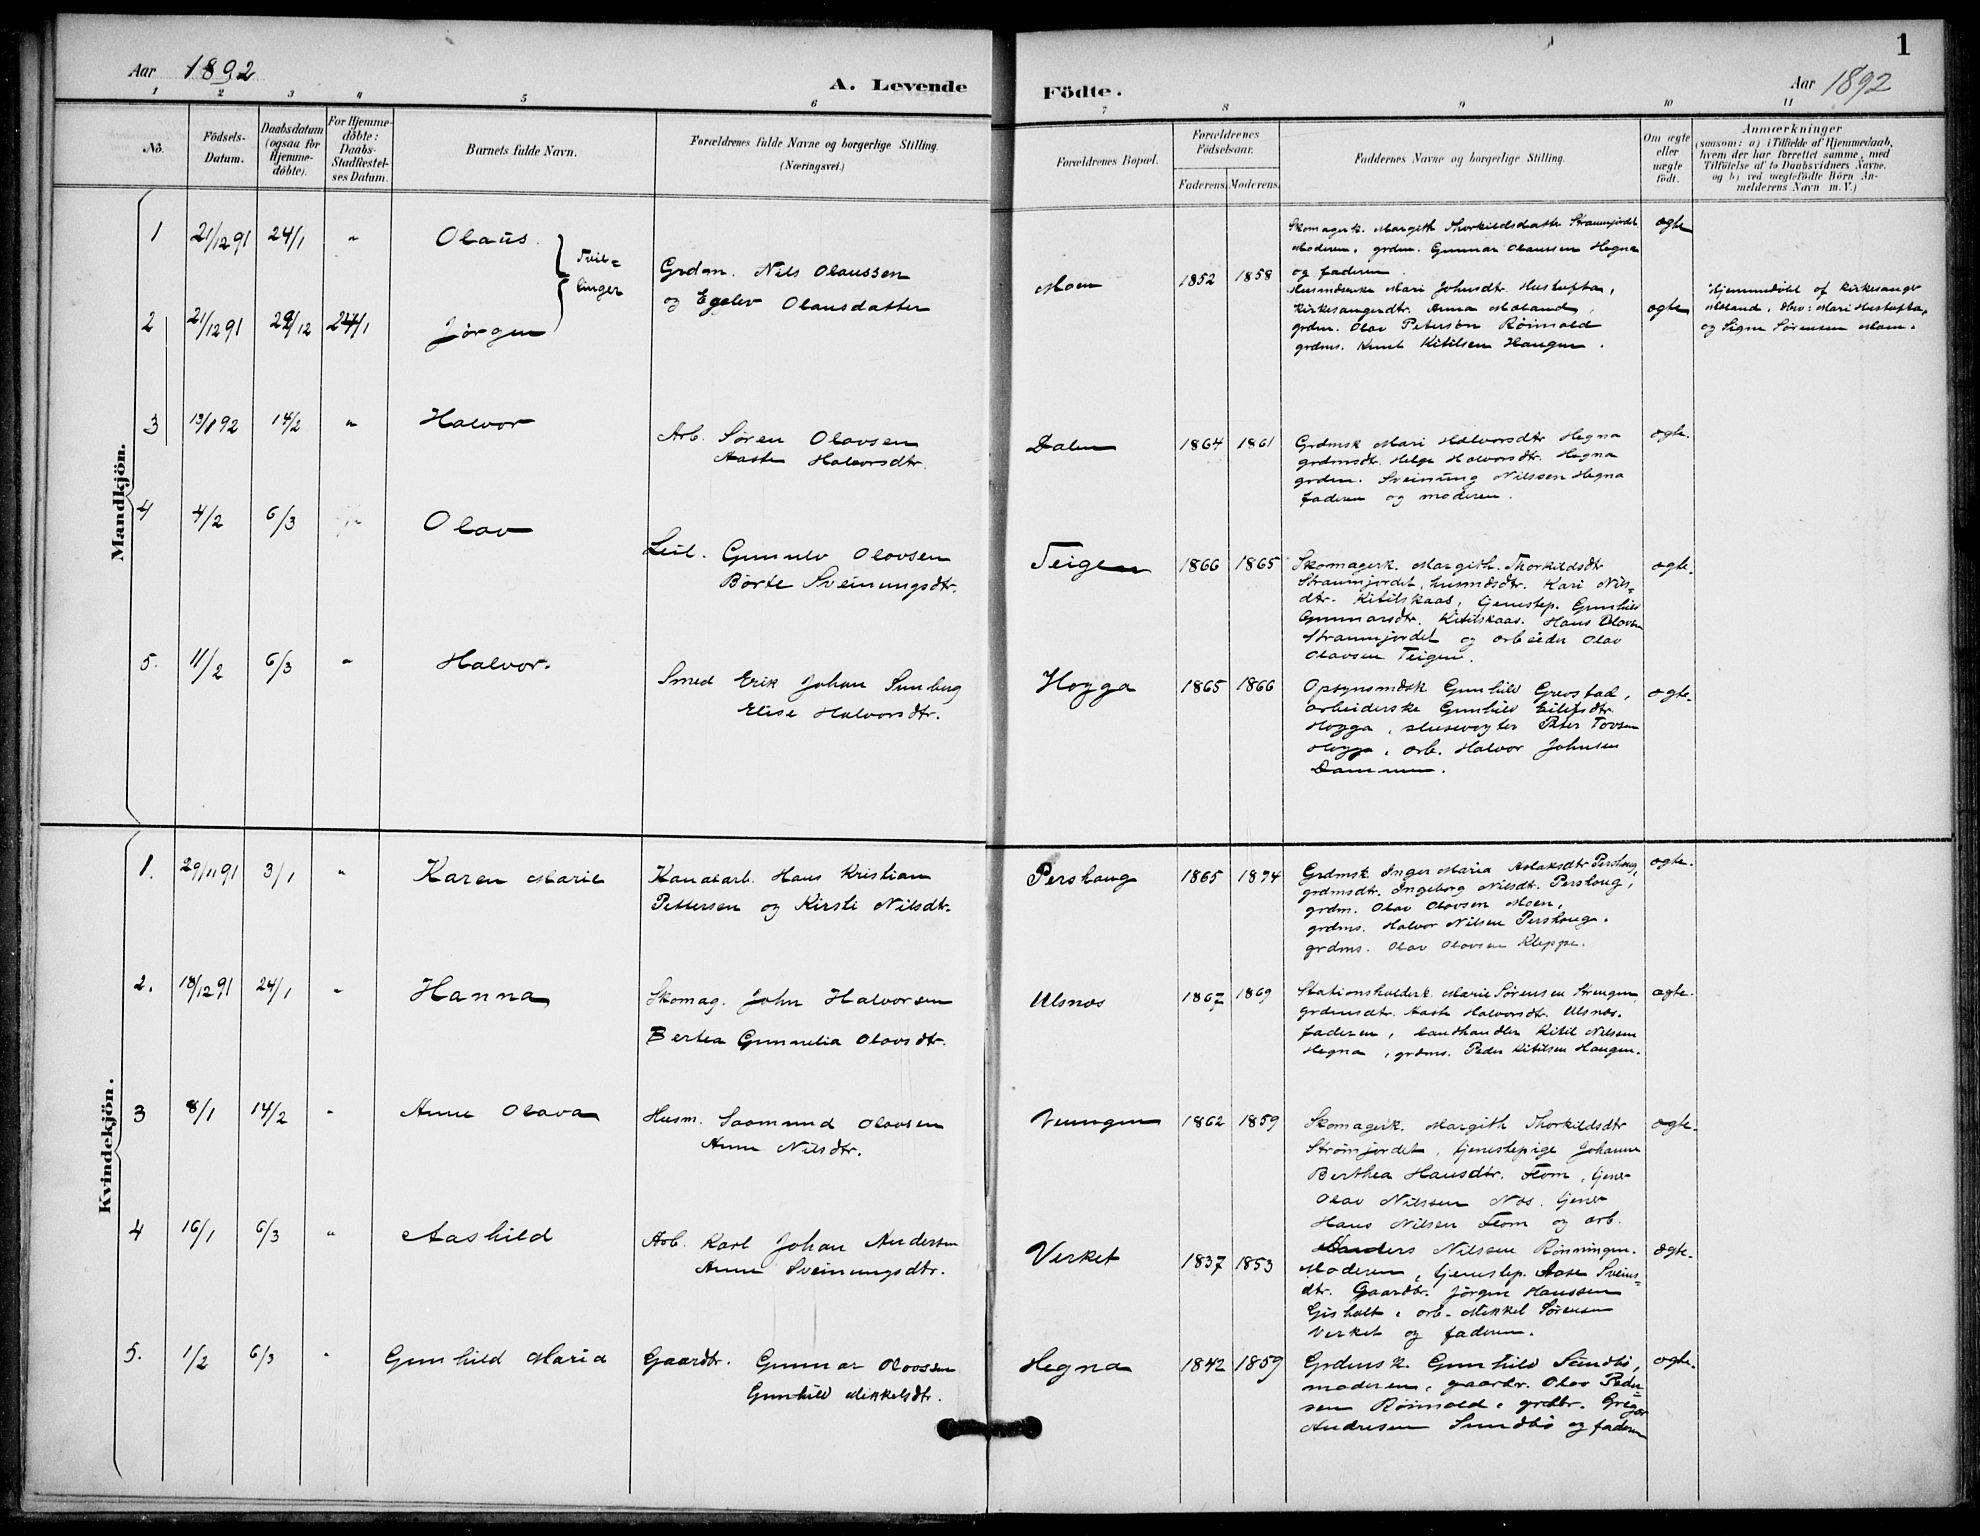 SAKO, Lunde kirkebøker, F/Fb/L0004: Ministerialbok nr. II 4, 1892-1907, s. 1